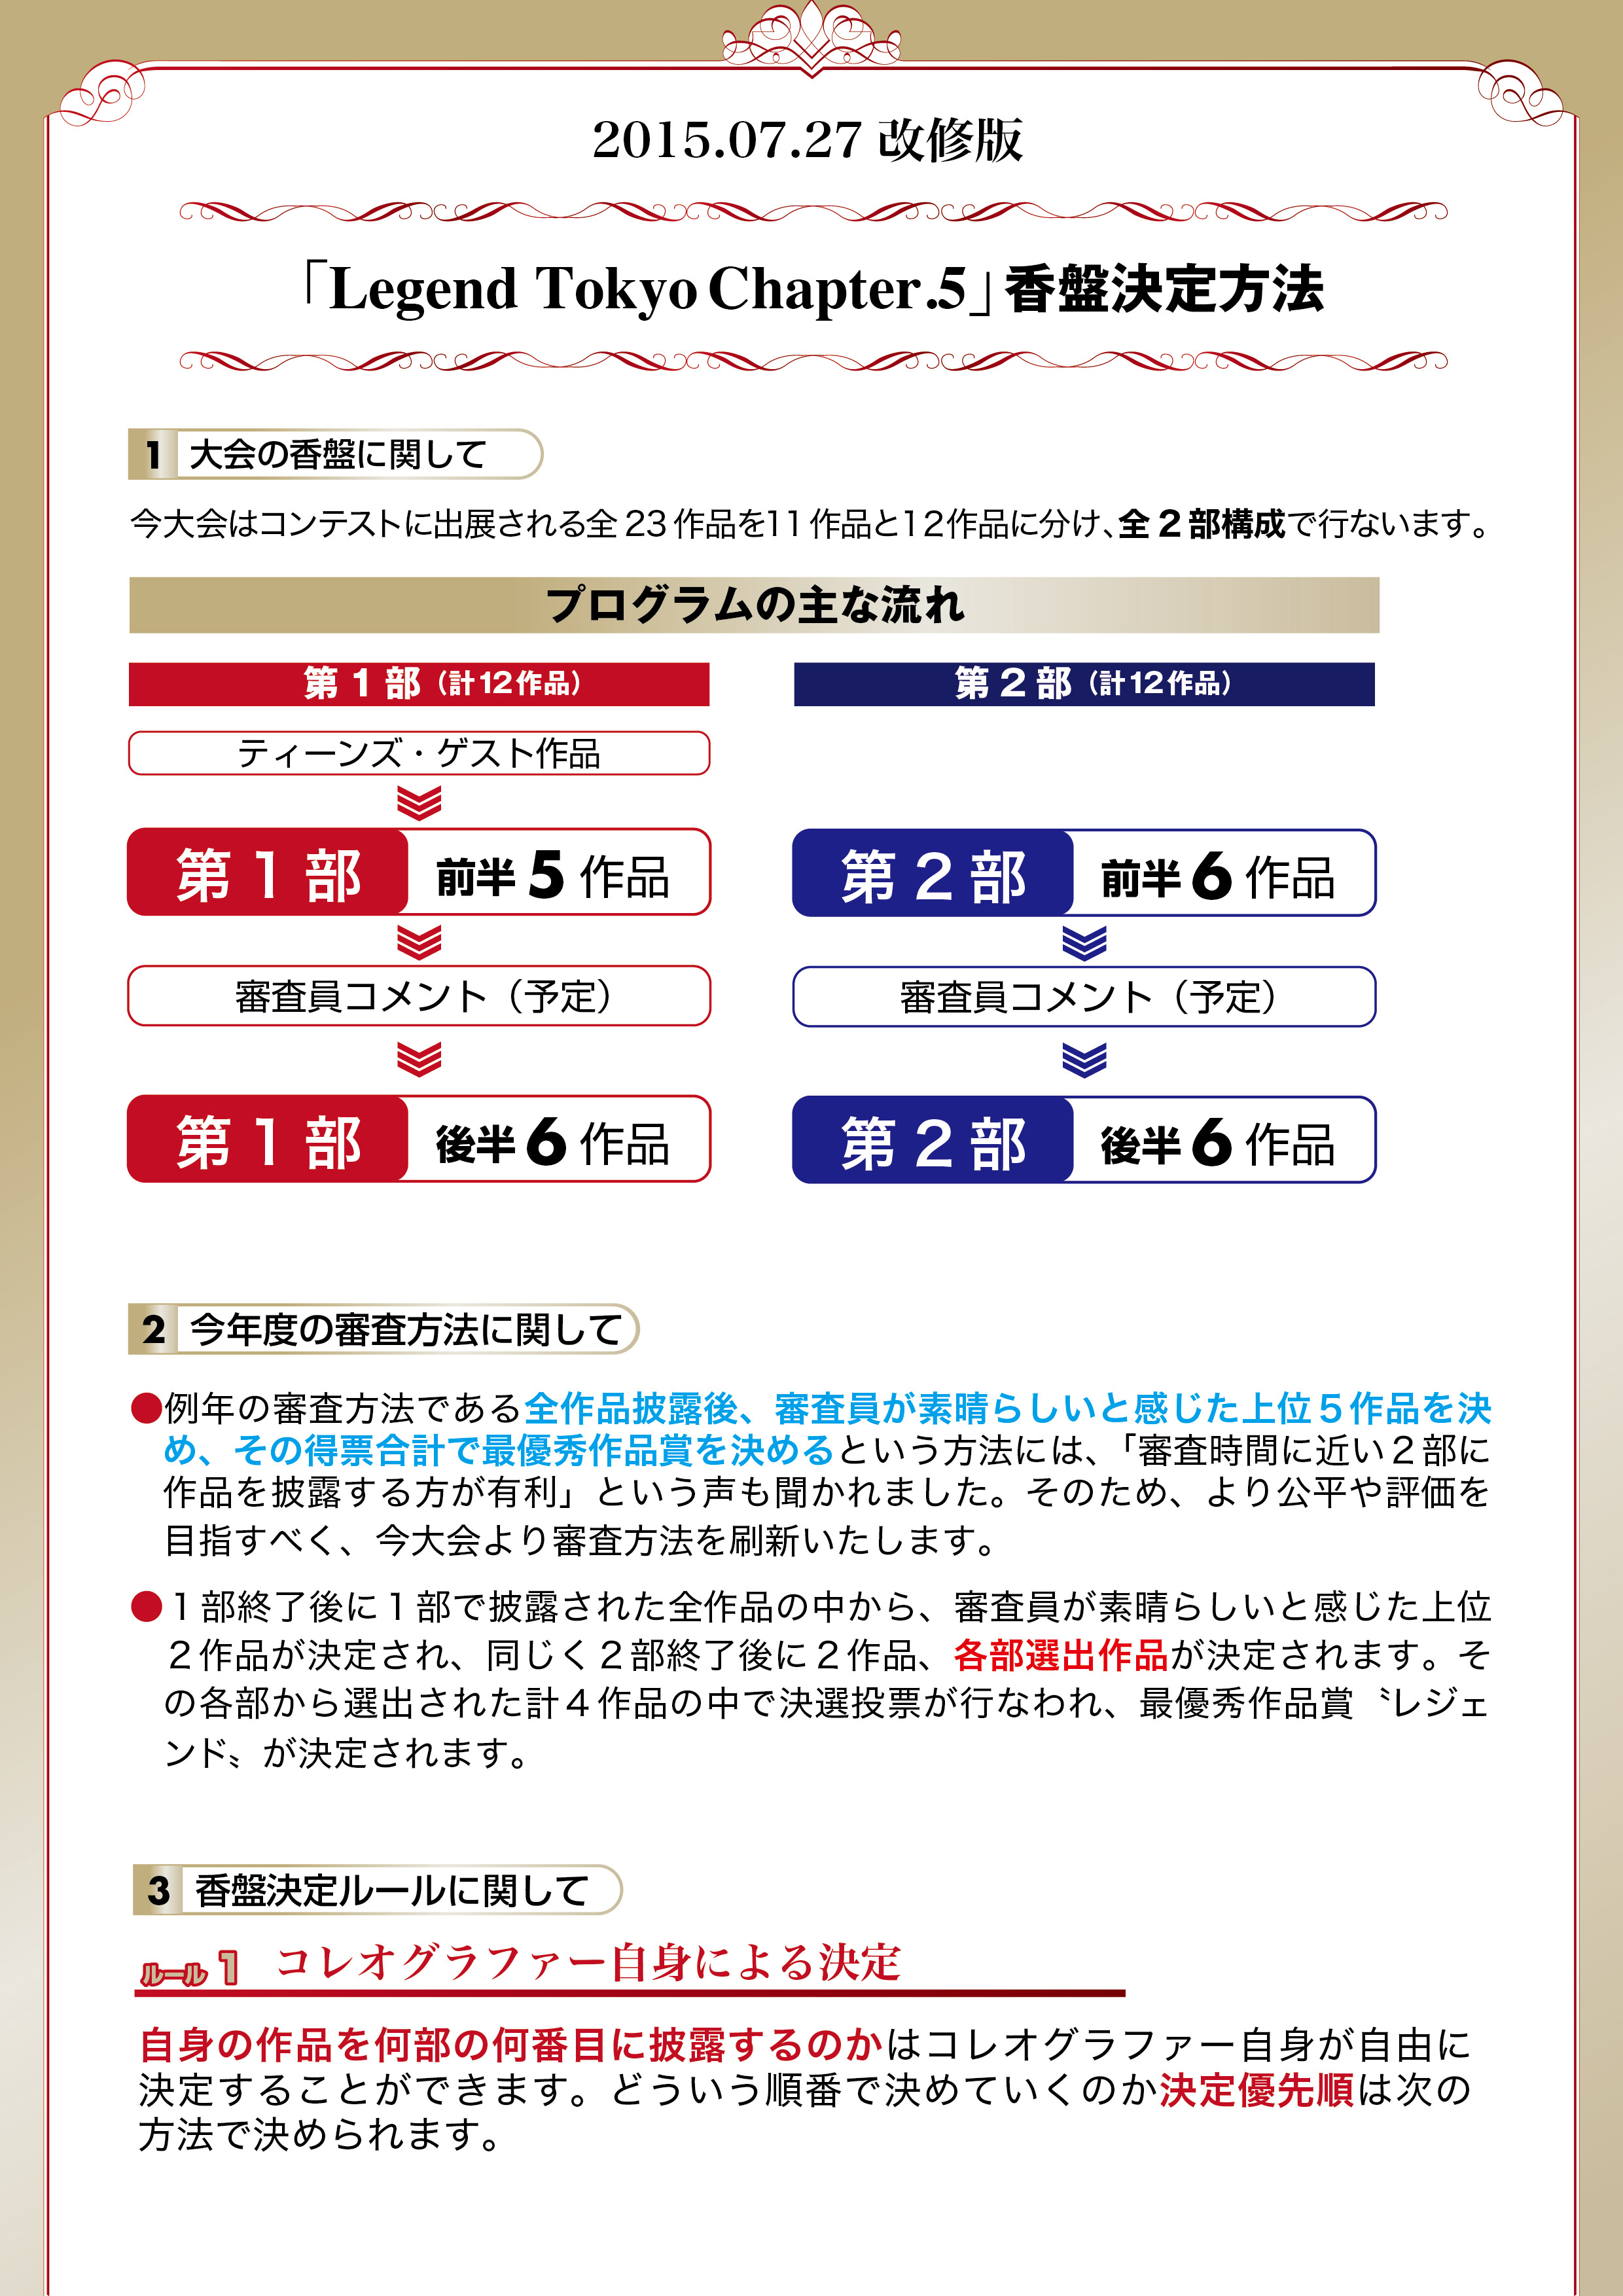 LT5香盤おしらせweb用new-01